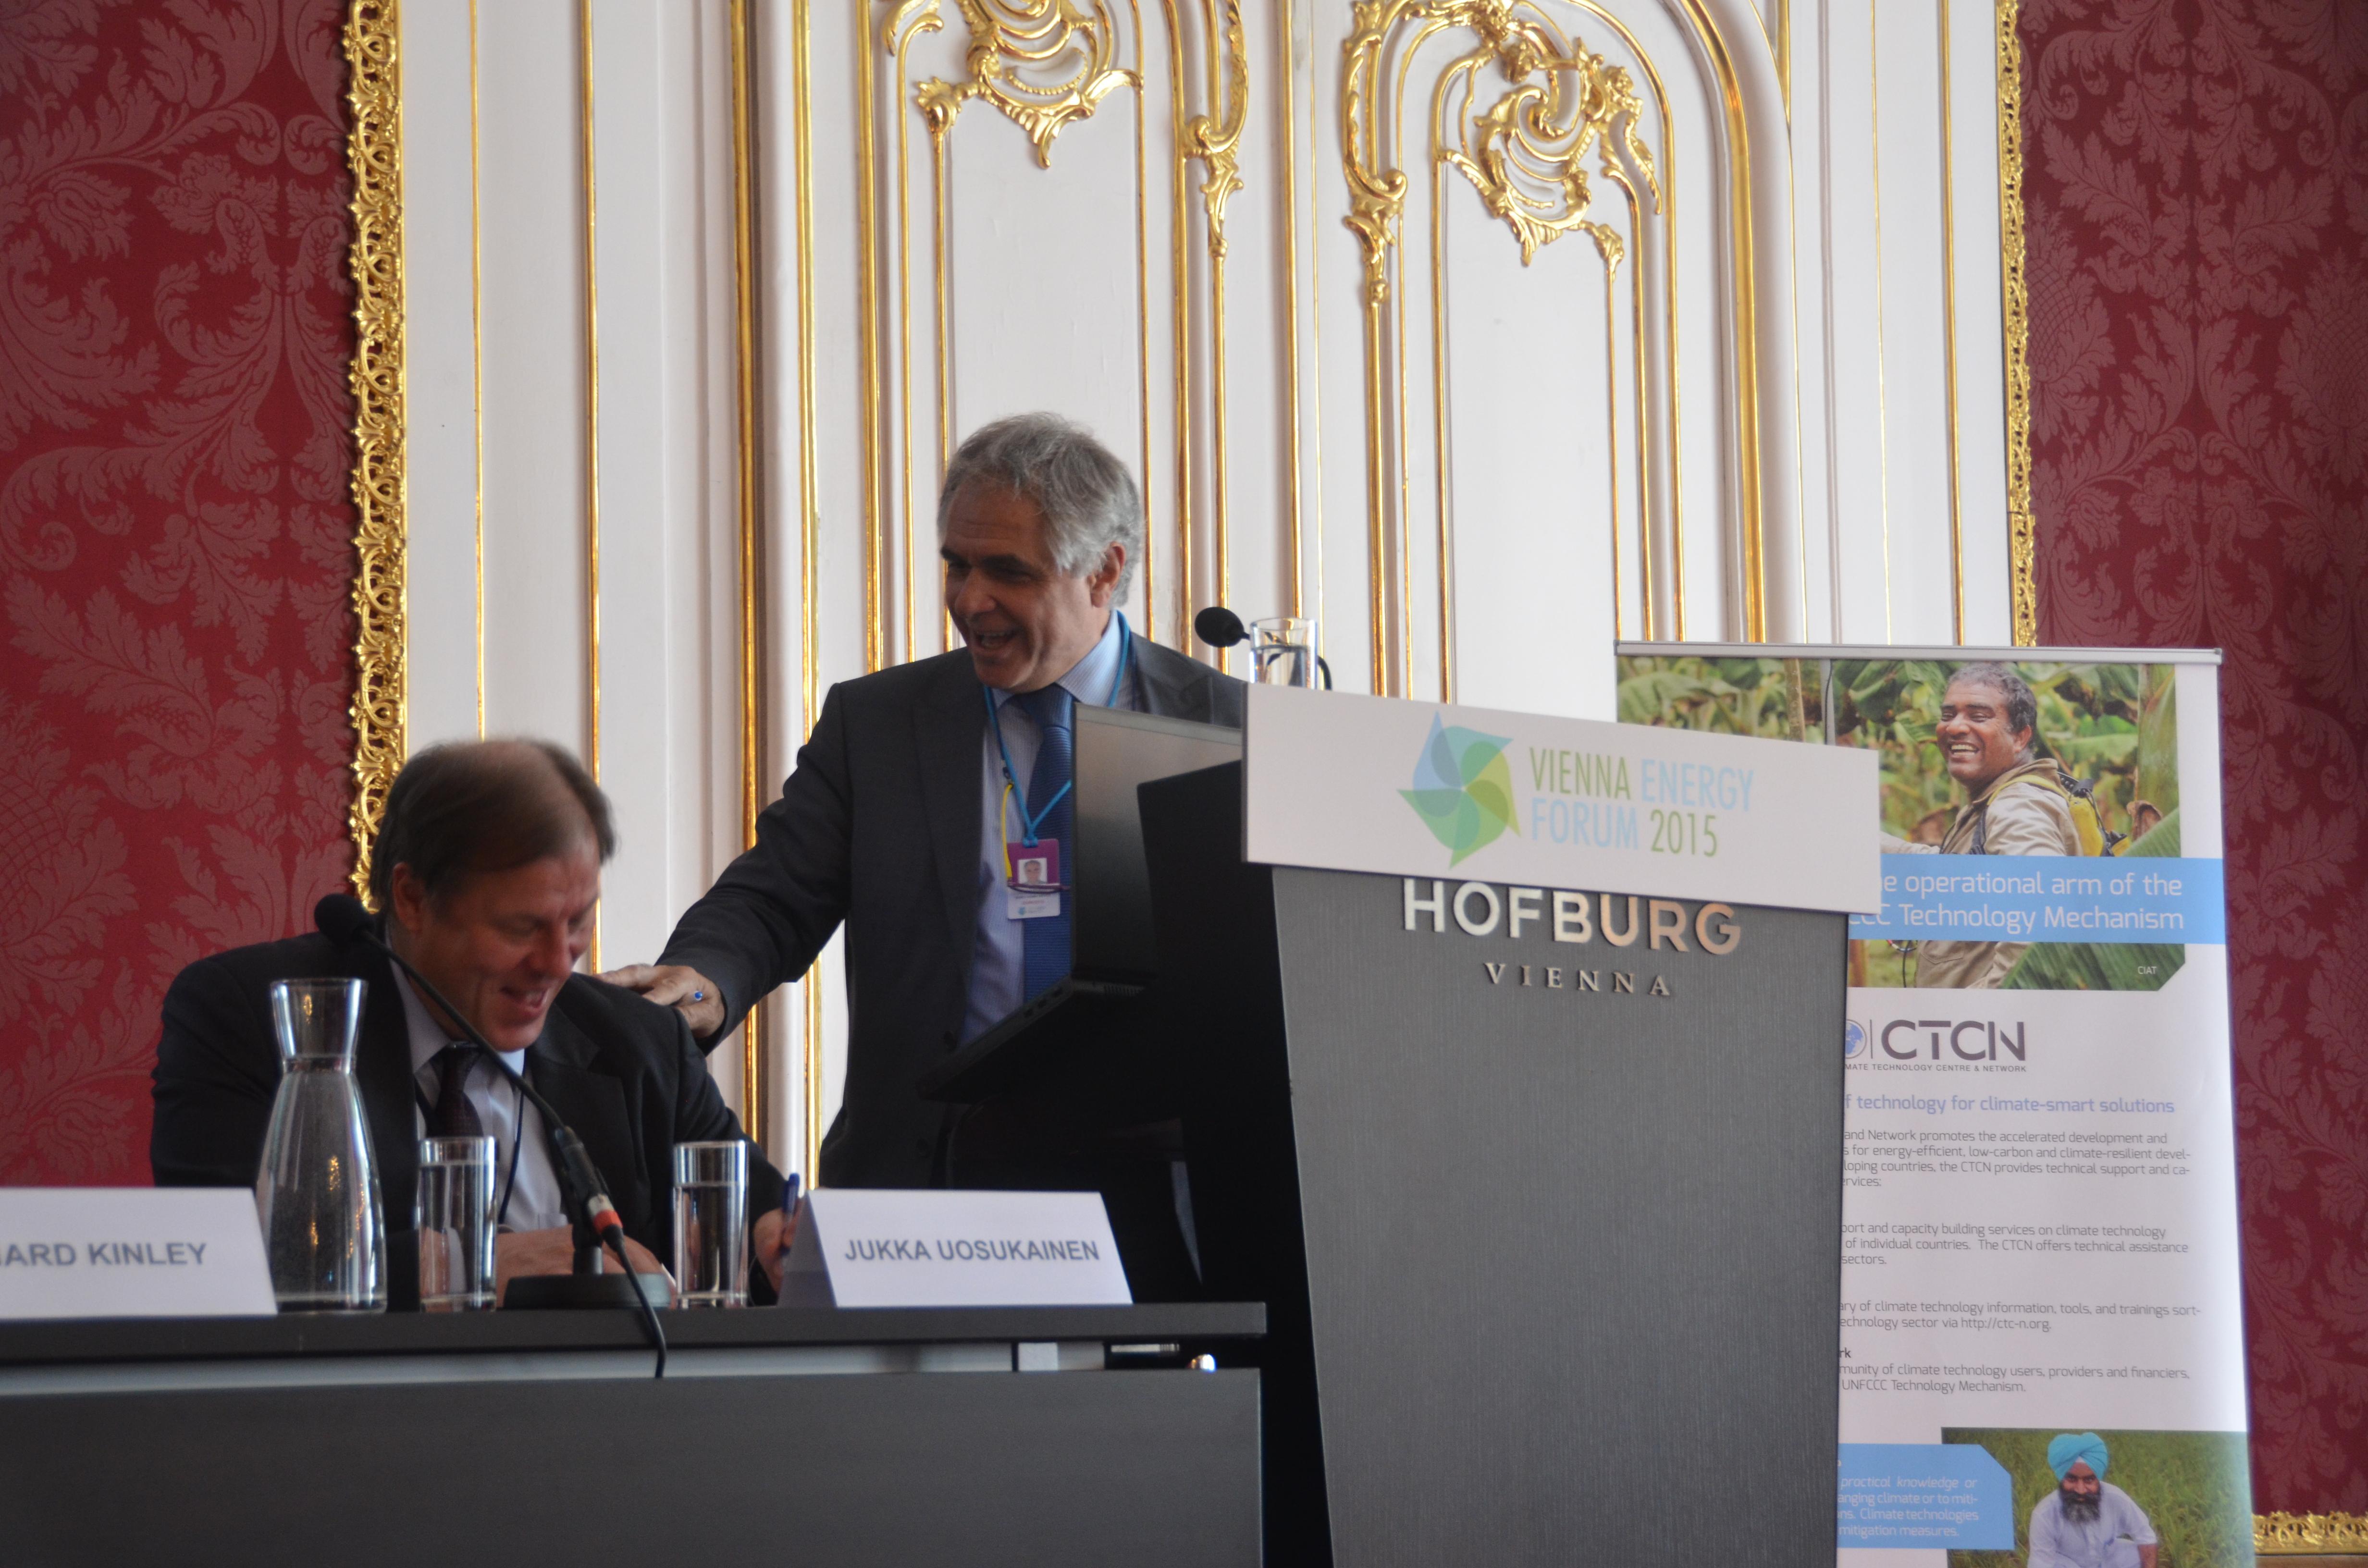 Vienna_Energy_Forum_2015 132.JPG